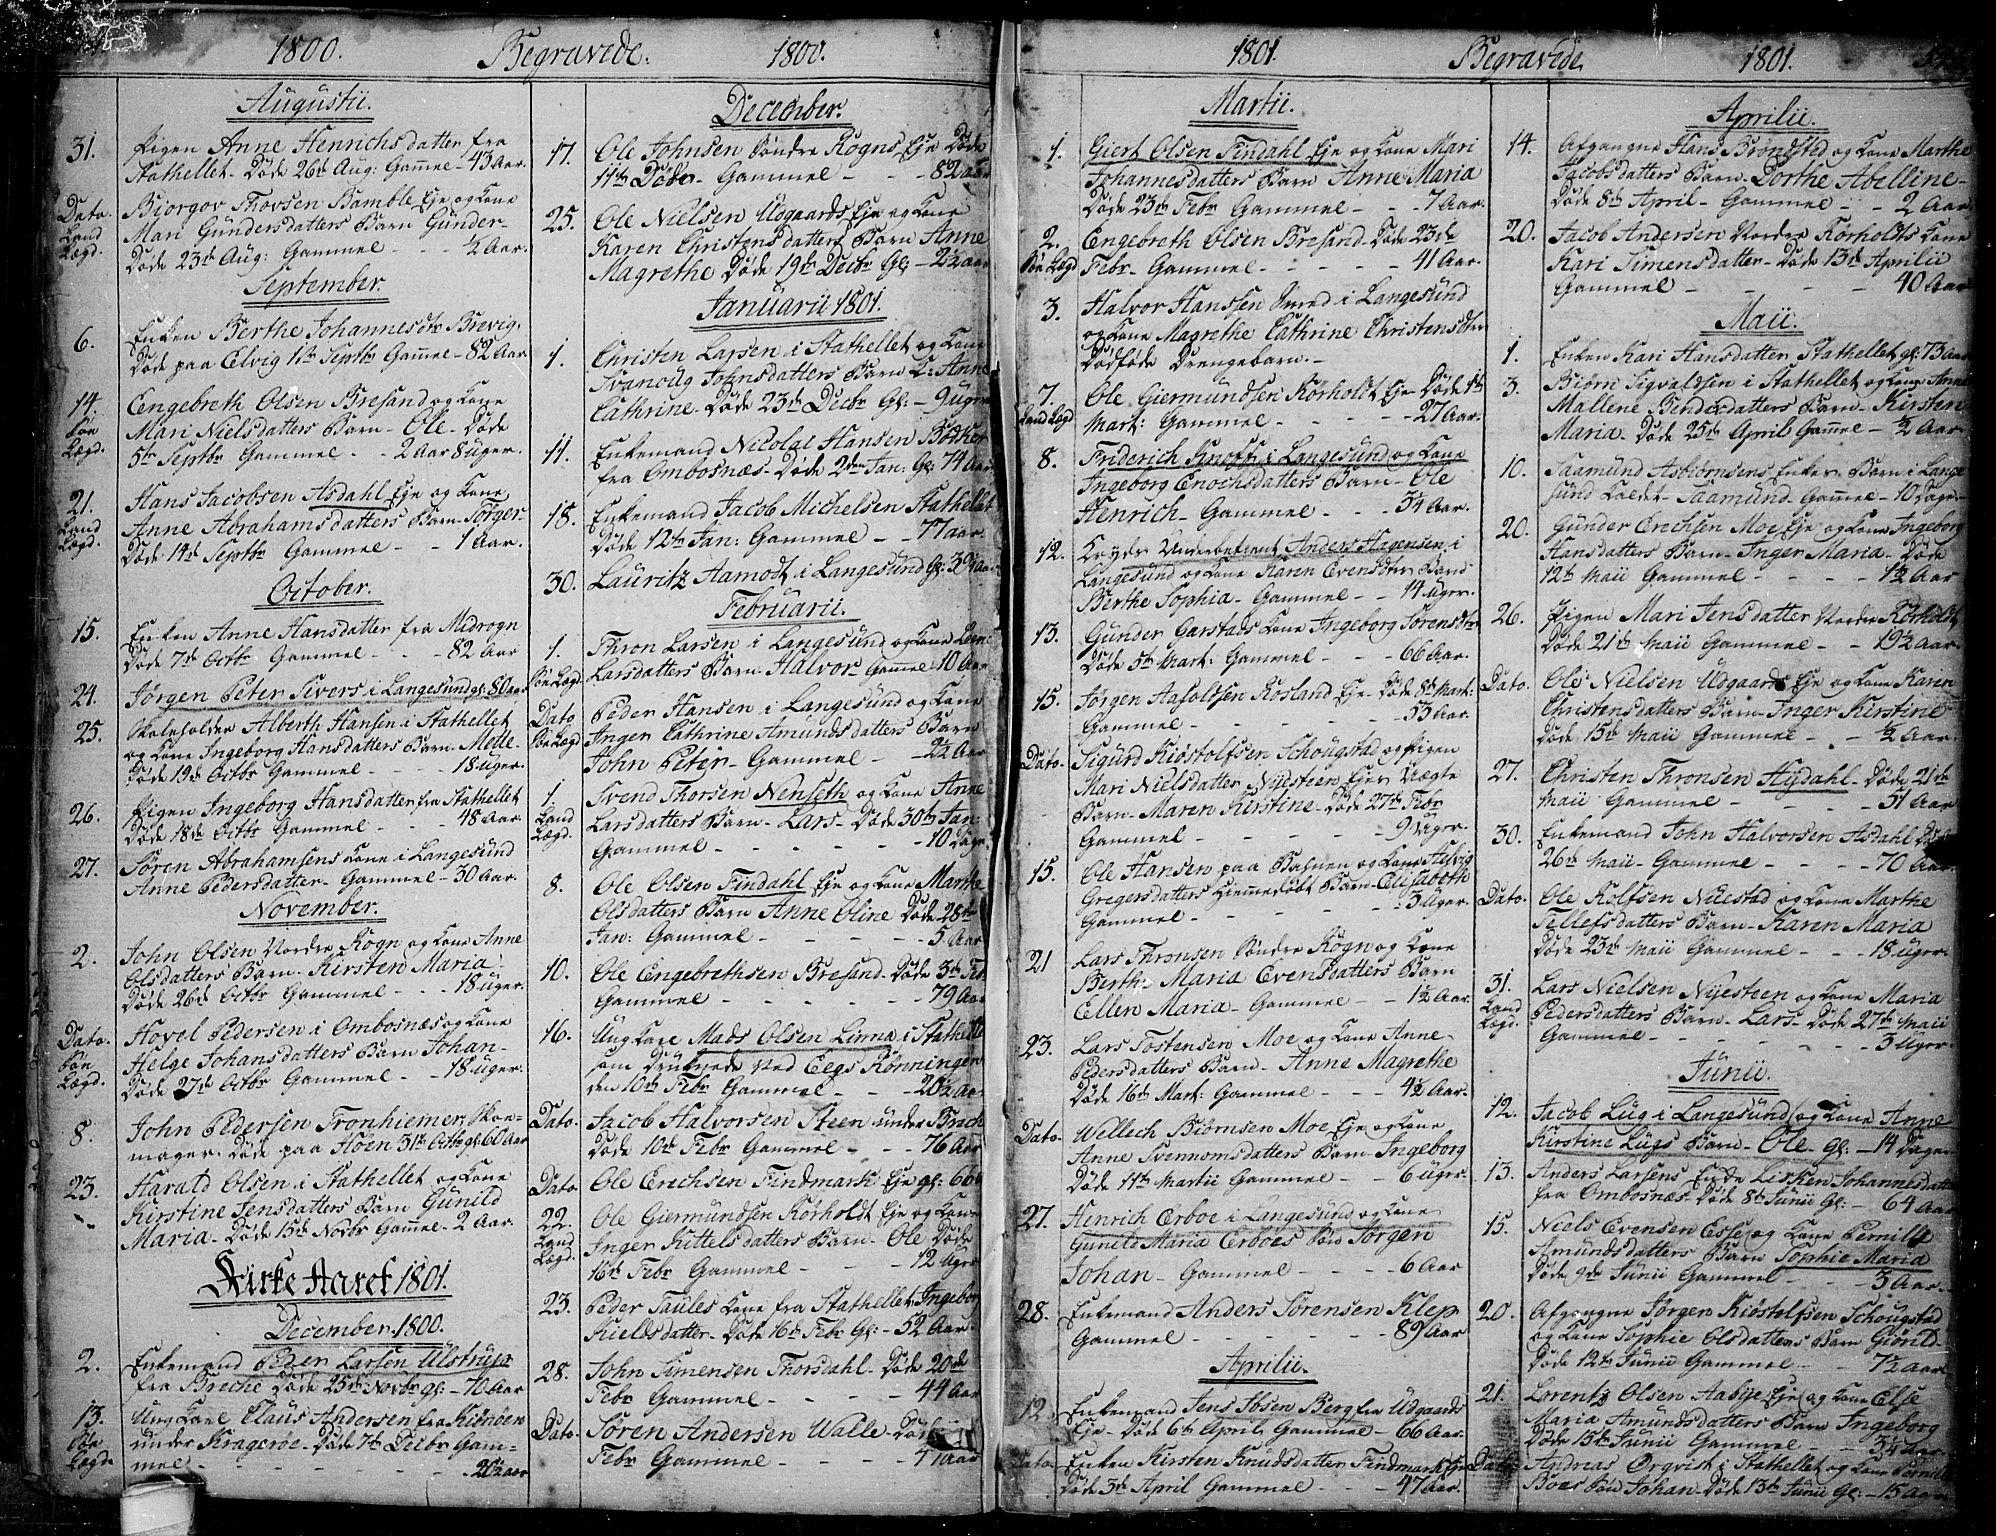 SAKO, Bamble kirkebøker, F/Fa/L0002: Ministerialbok nr. I 2, 1775-1814, s. 544-545